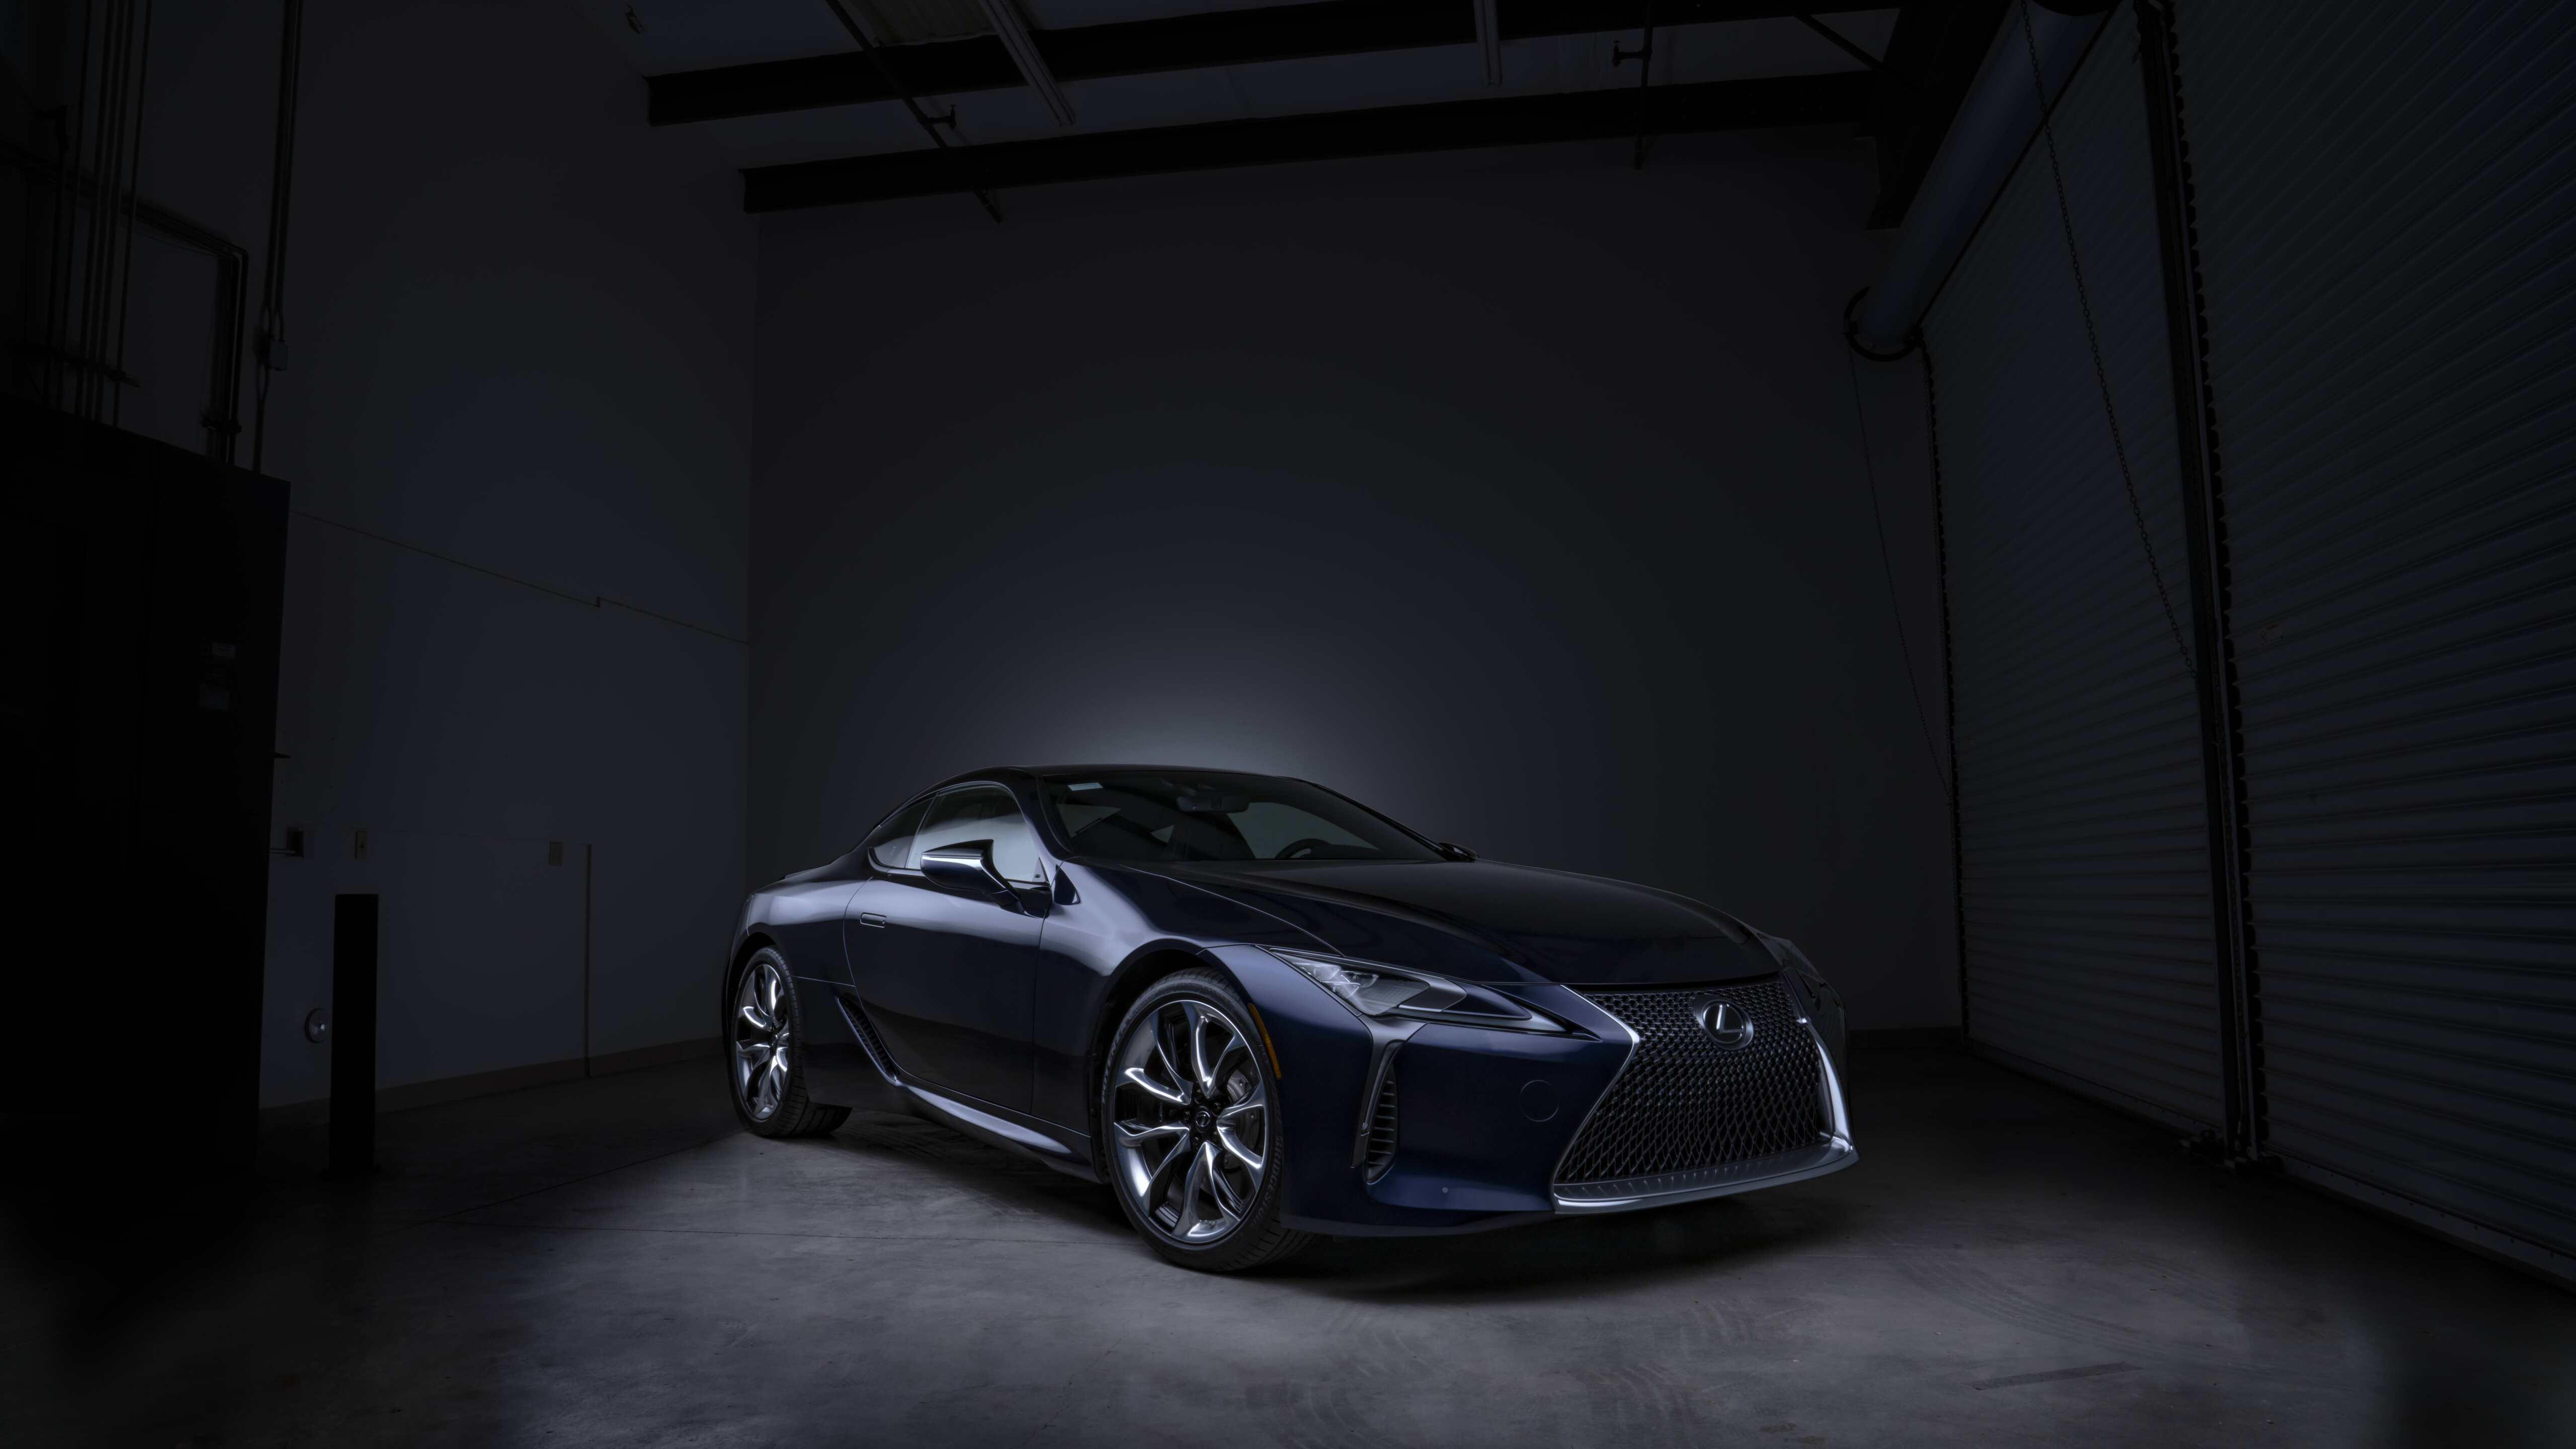 5120x2880 Lexus Black Panther Lc 500 Photoshoot 5k Hd 4k